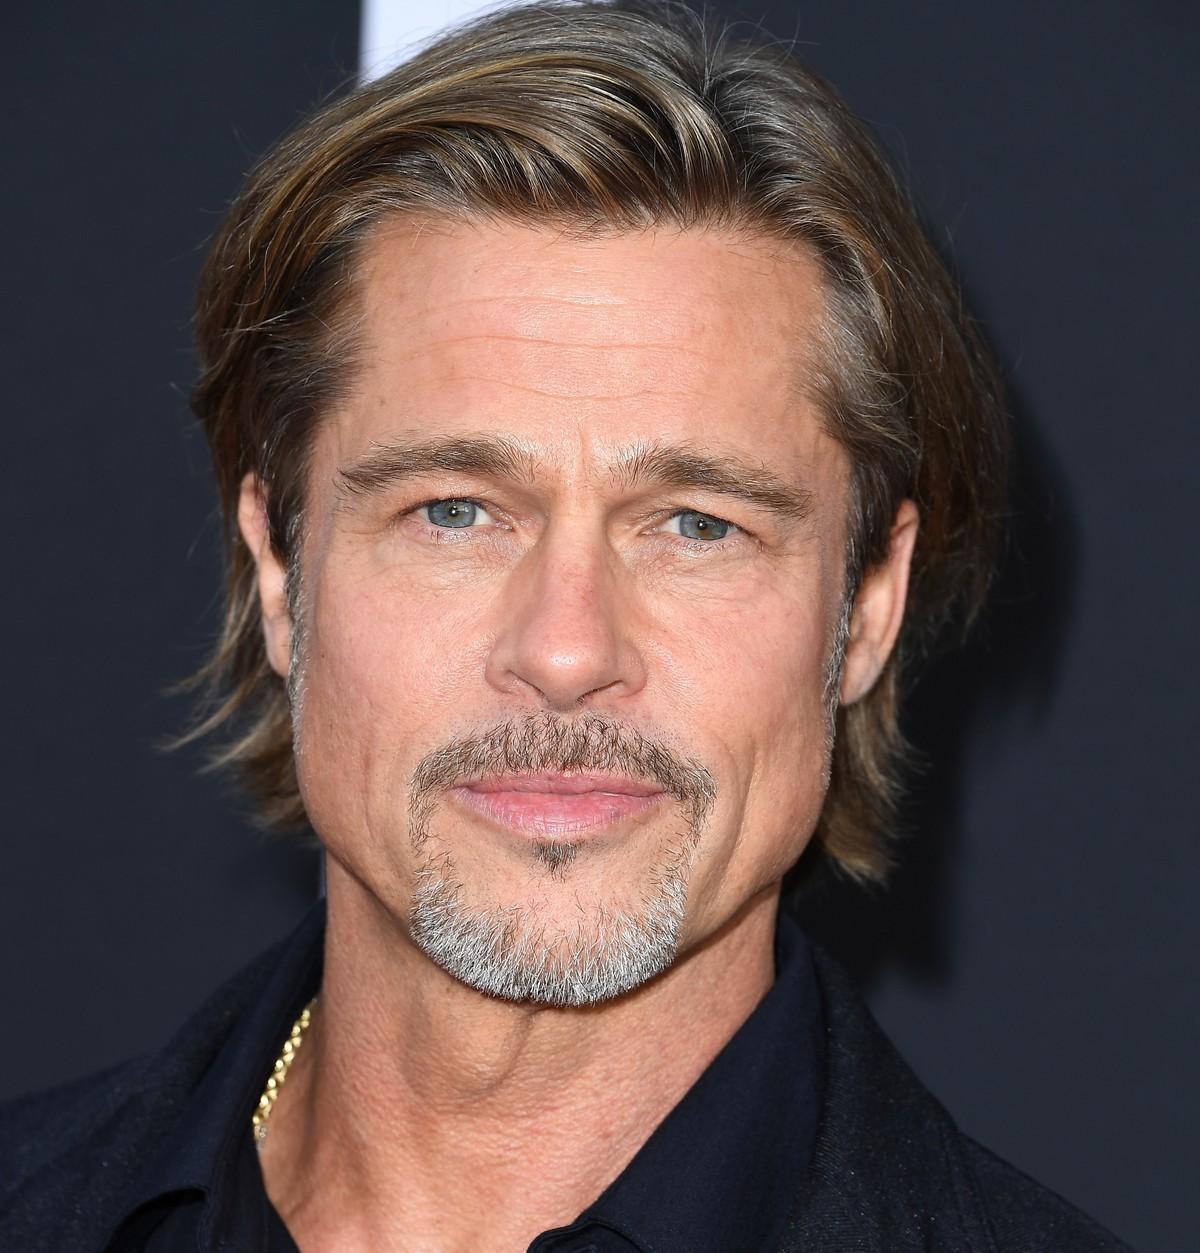 Brad Pitt: 90.51 Percent Accurate